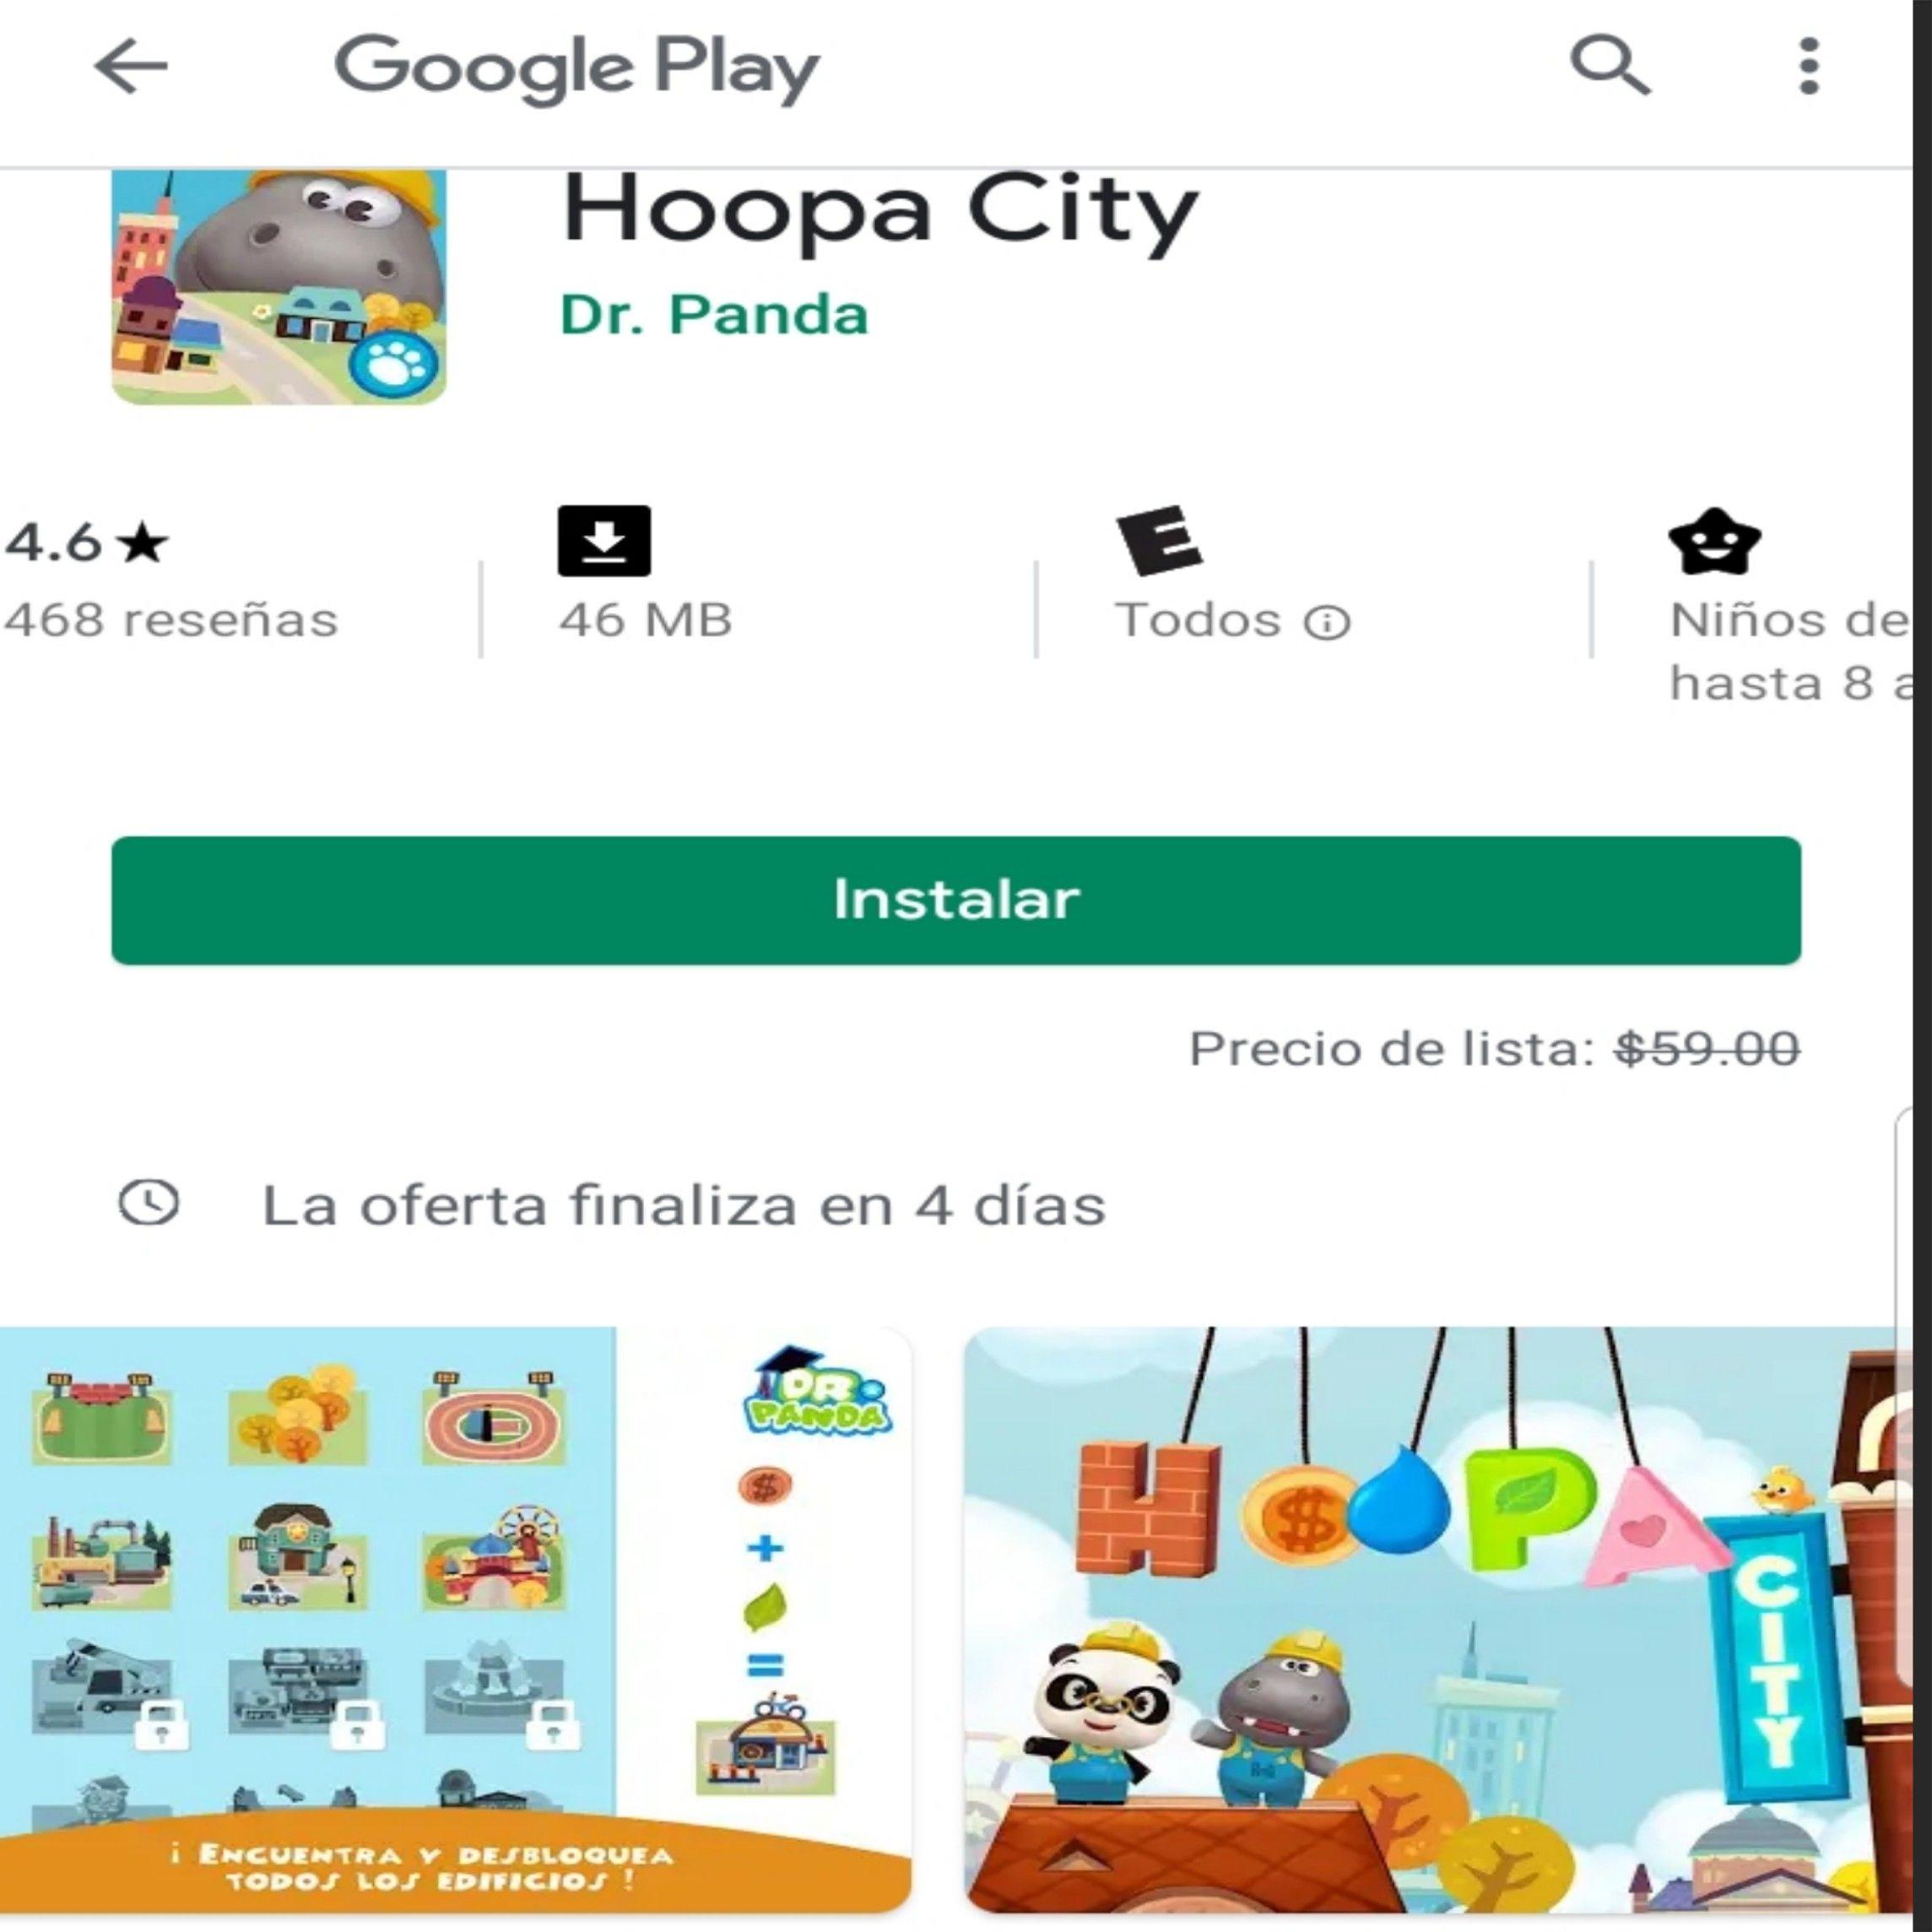 Google Play: Hoopa City 1 Dr Panda (Precio habitual $59)